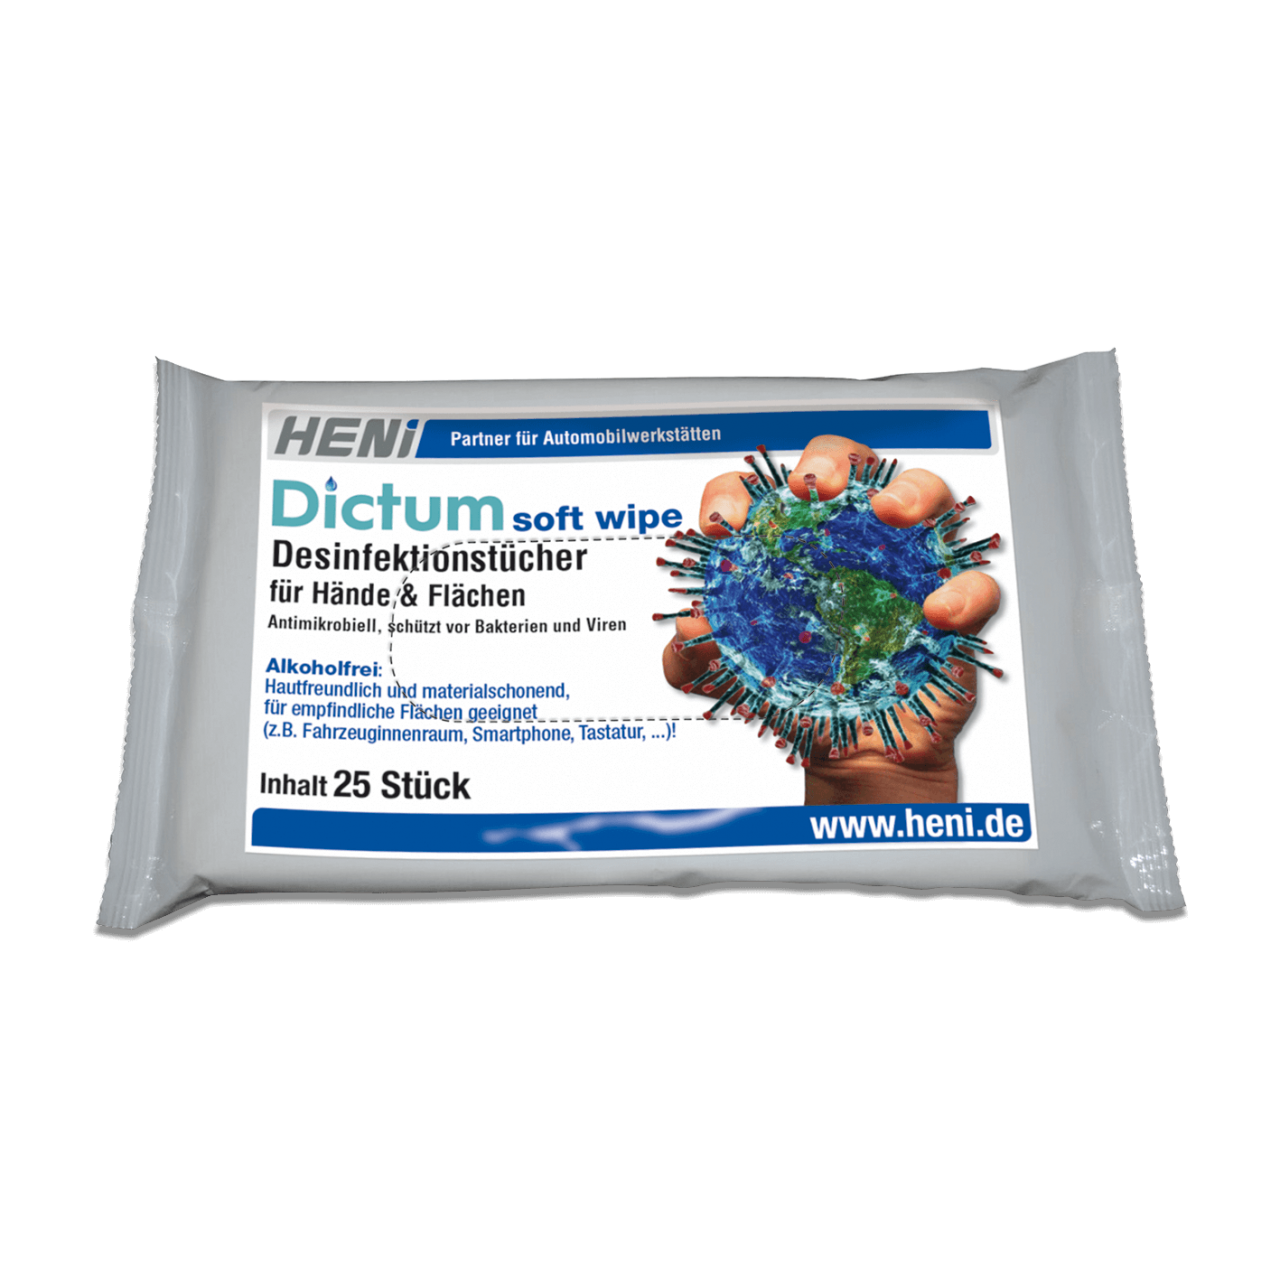 Desinfektionstücher Dictum soft-wipe (MB 6) Bild 1